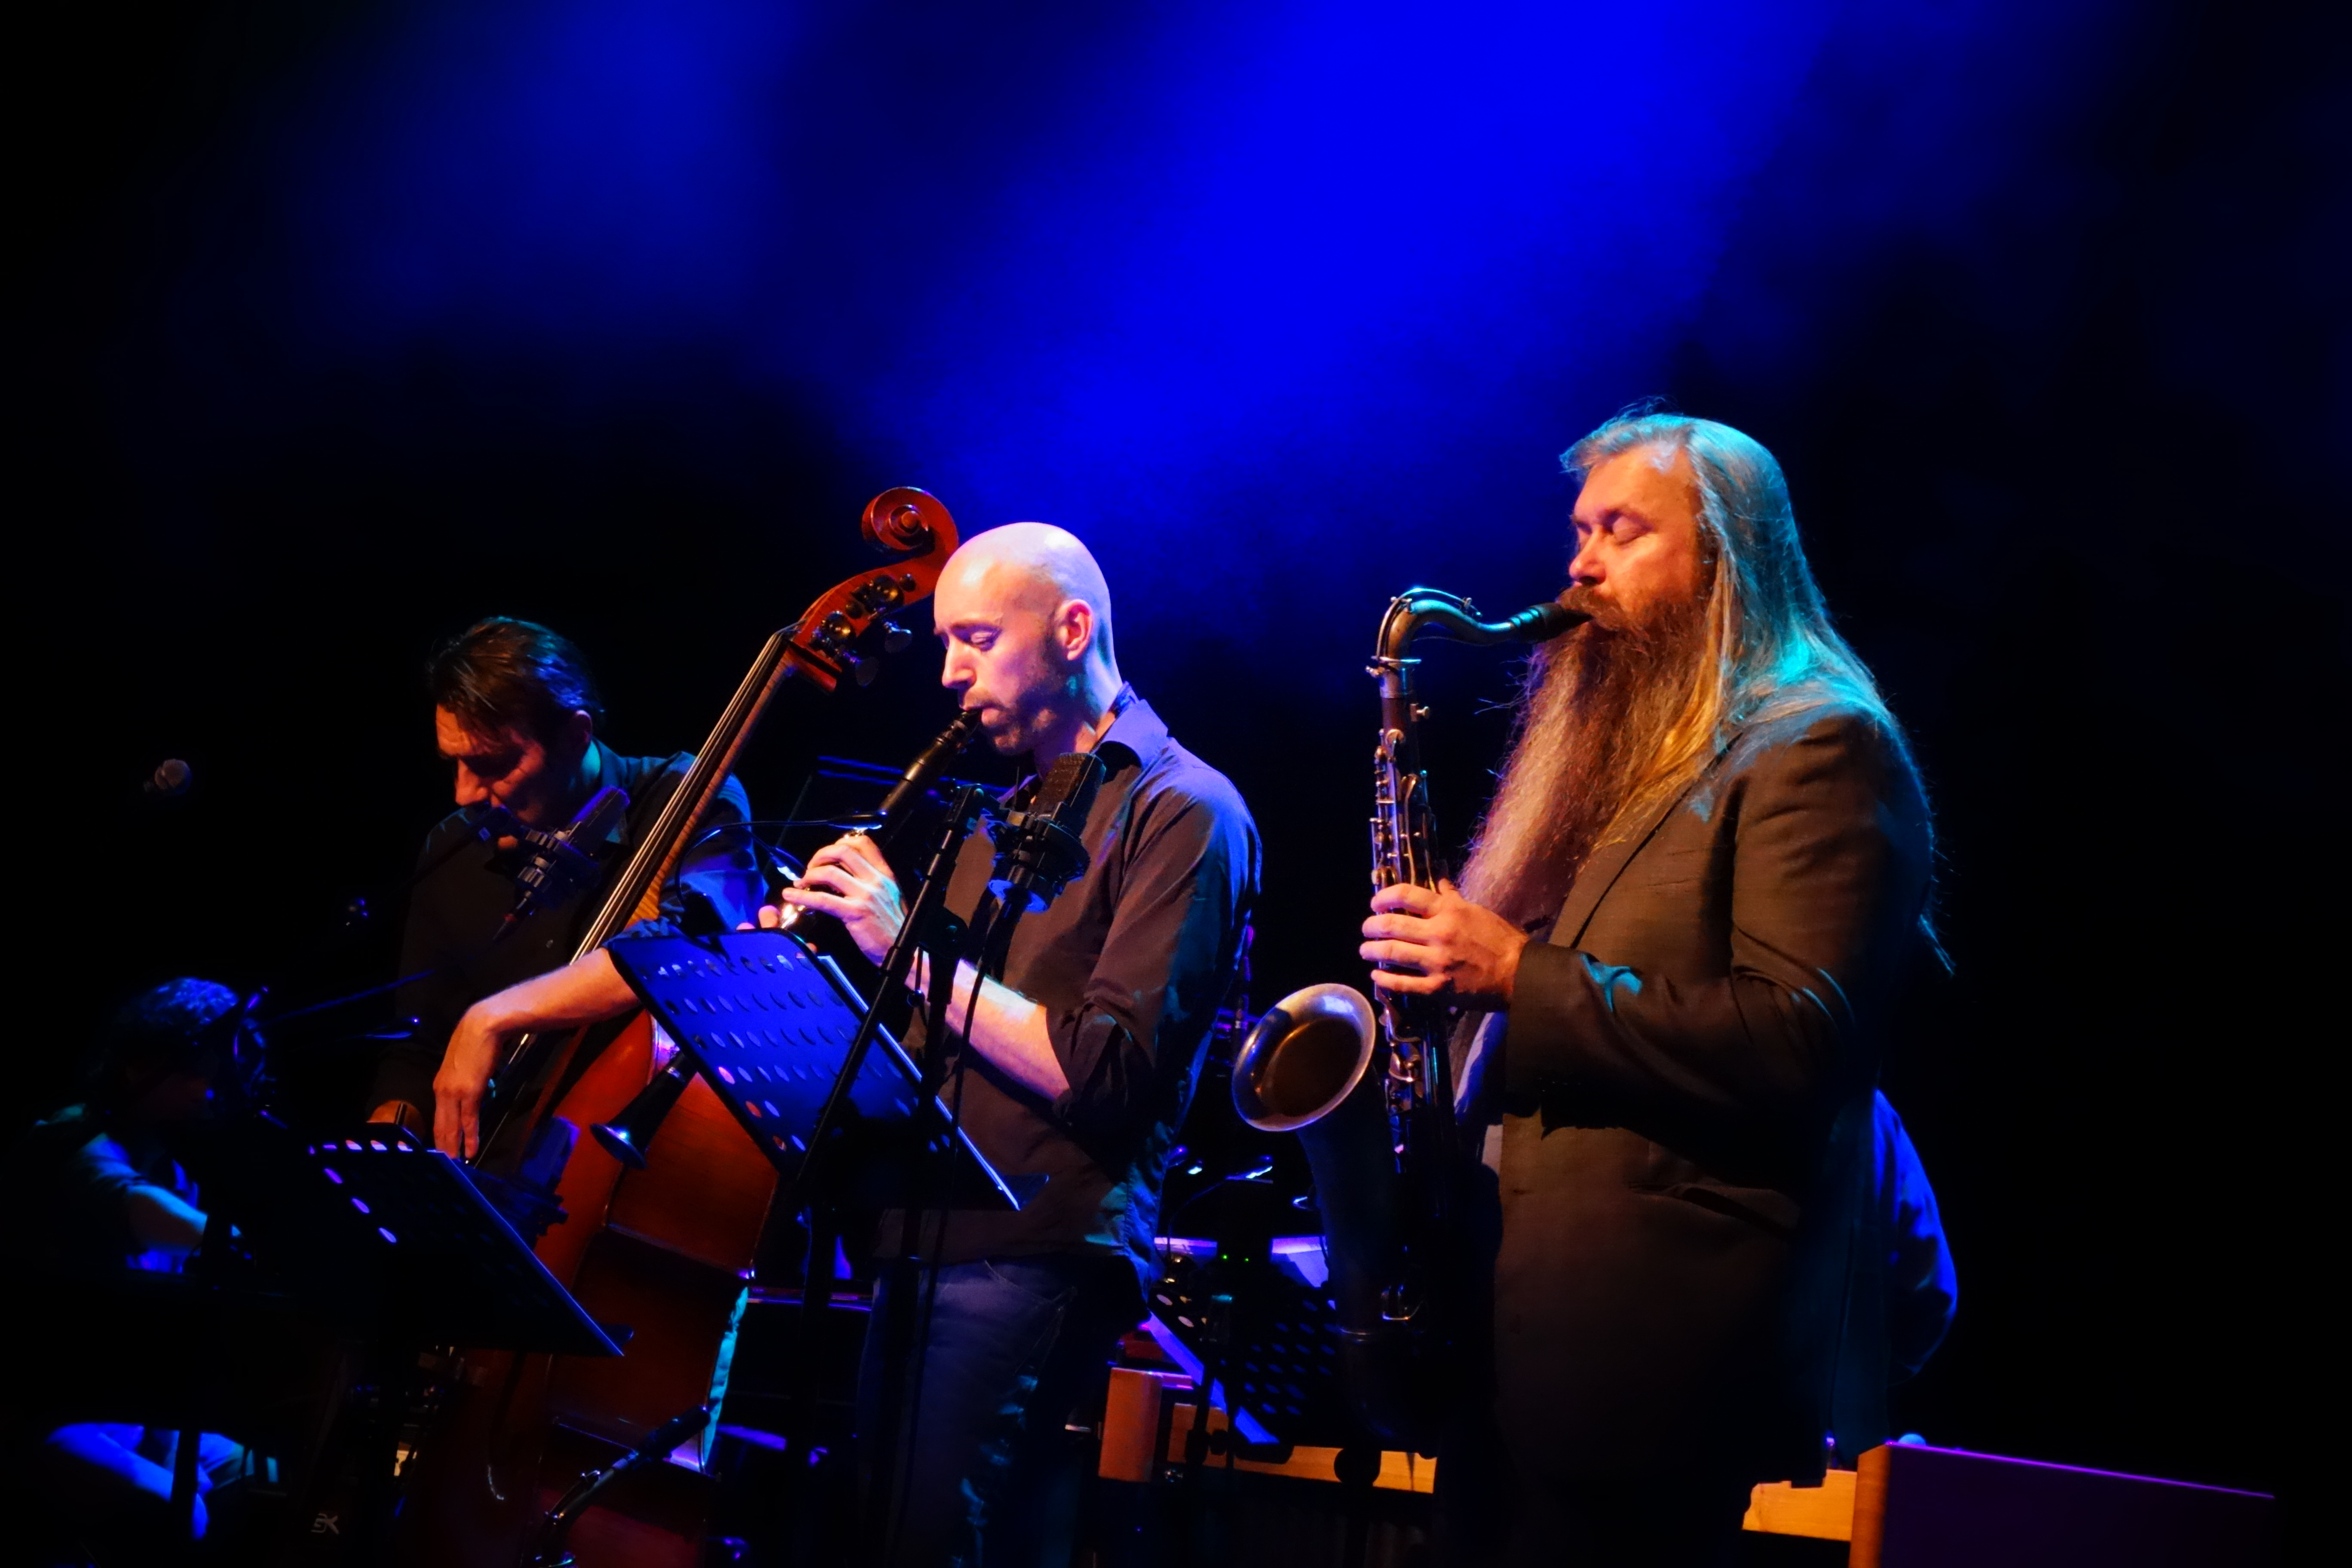 Mats Eilertsen, Eirik Hegdal, Trygve Seim - Rotterdam Jazz International Festival